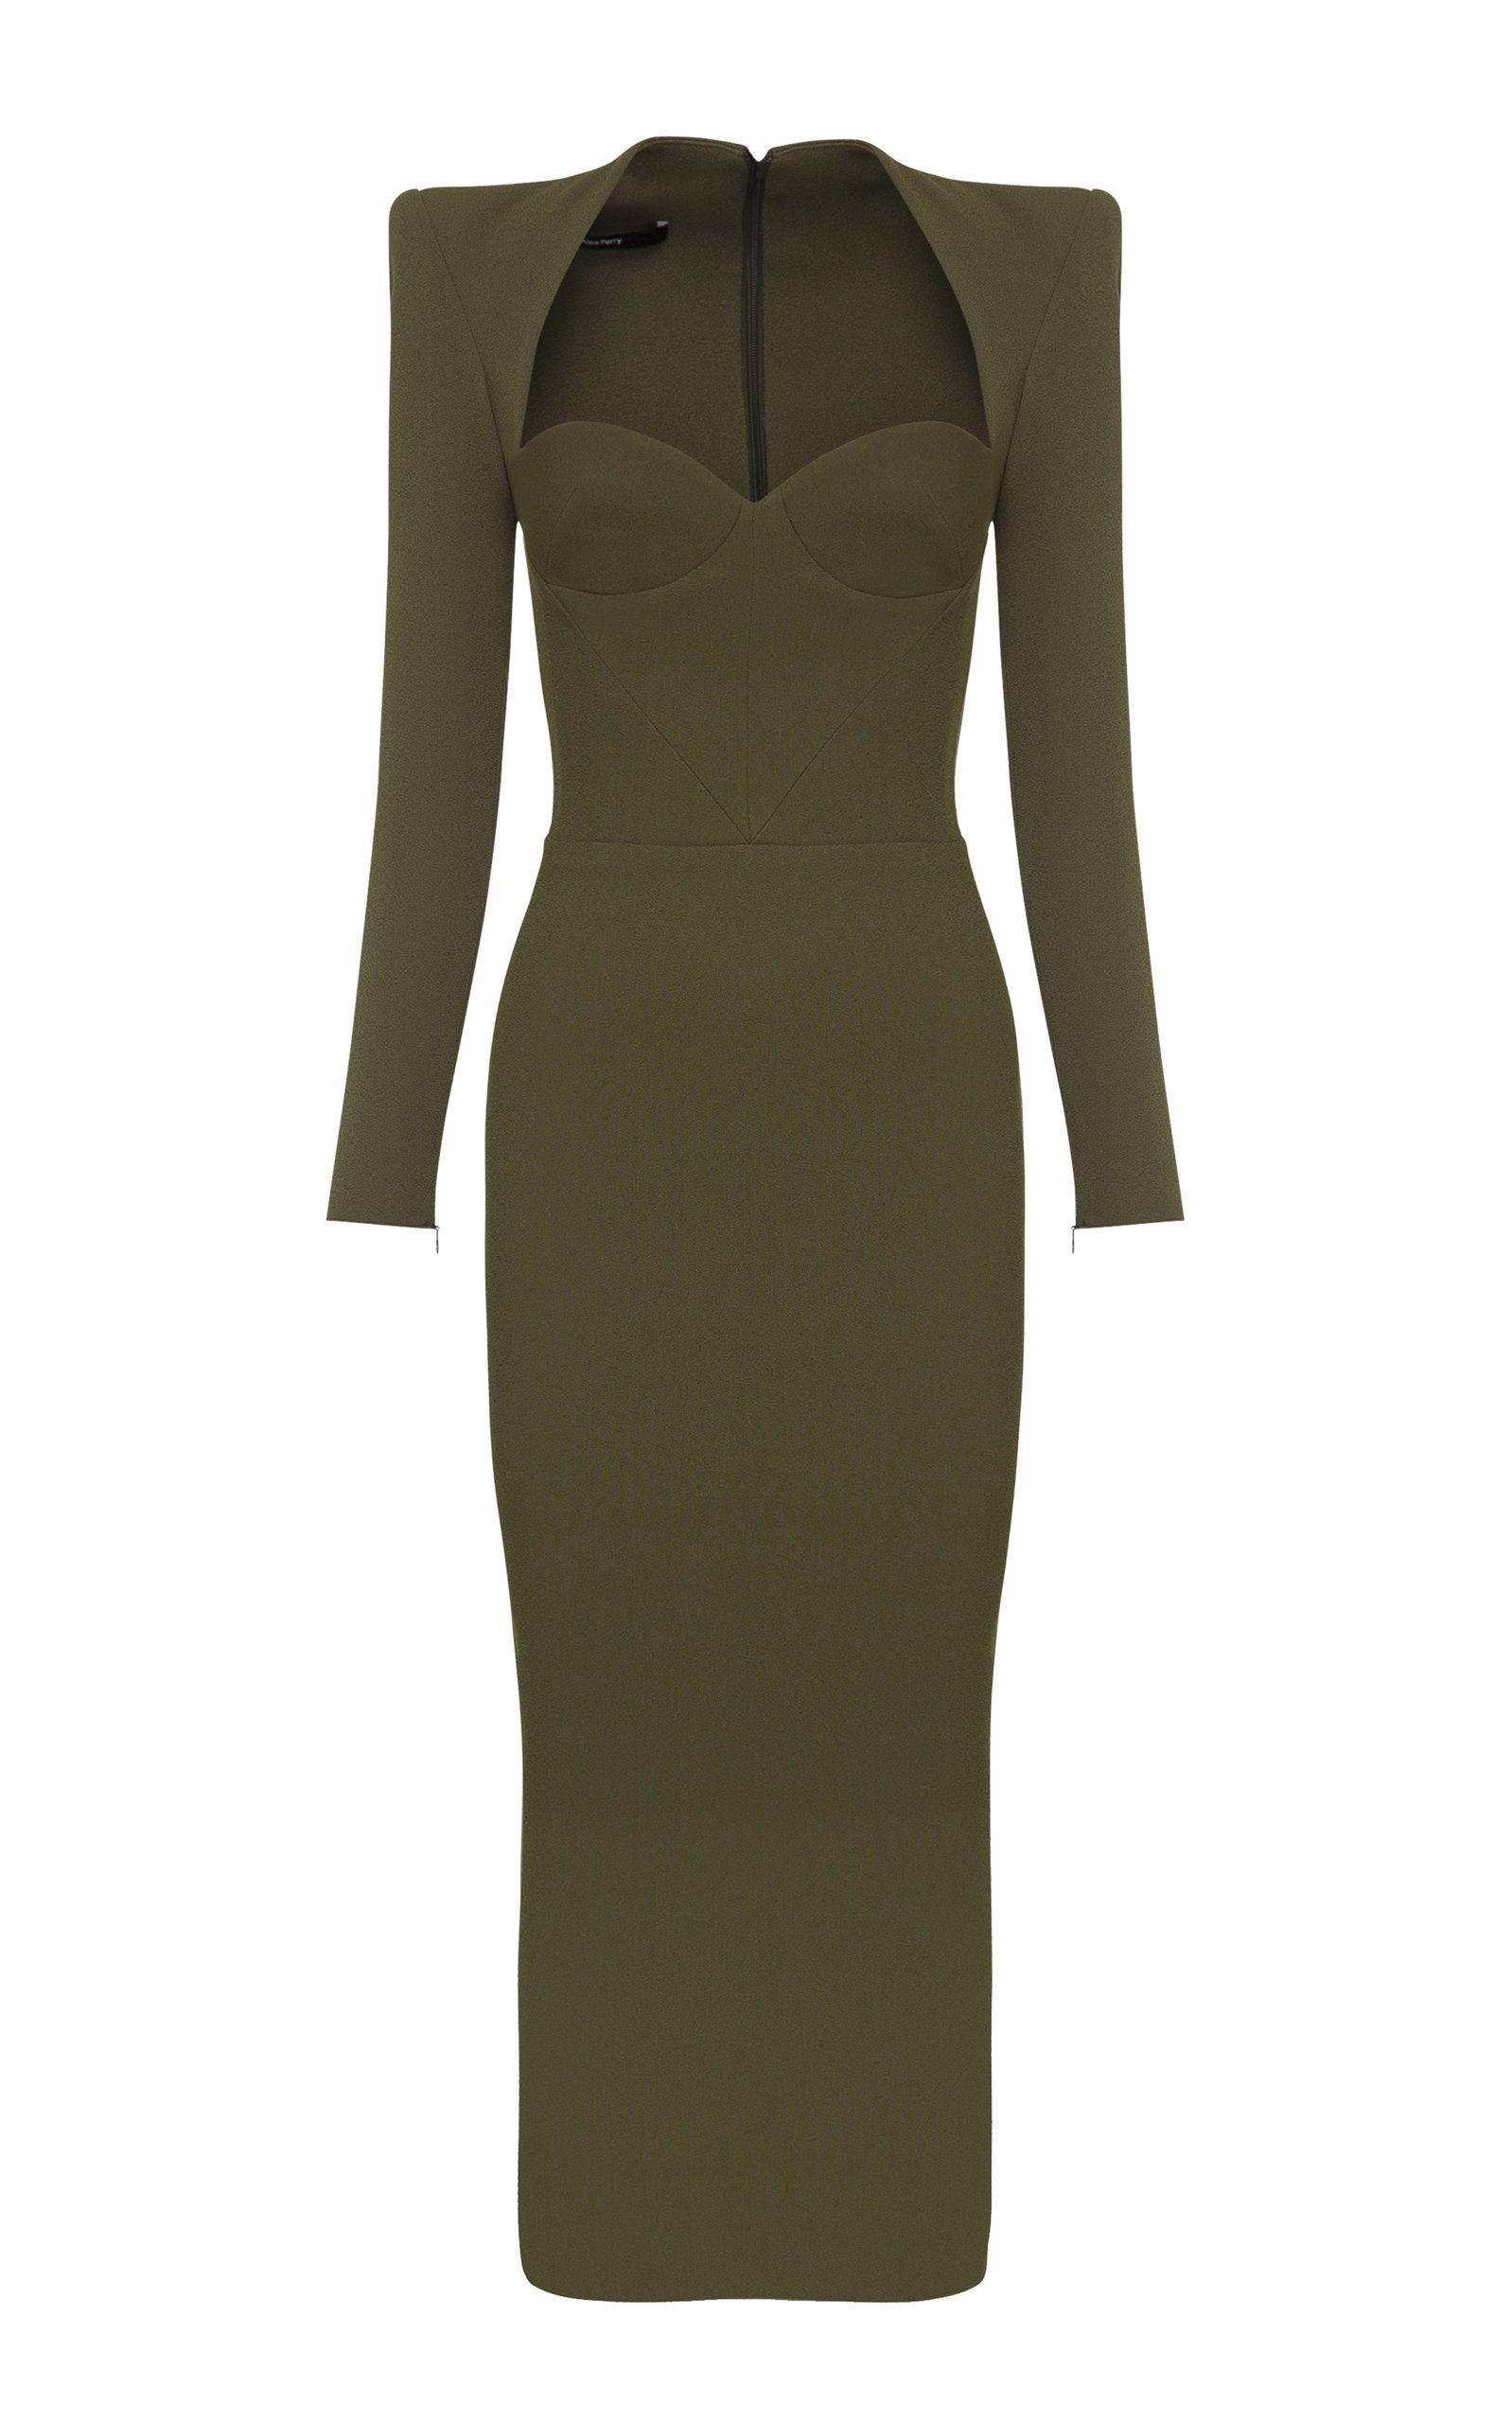 Alex Perry Ambrose Sweetheart Neck Crepe Midi Dress In 2021 Fashion Dresses Dress To Impress [ 2560 x 1598 Pixel ]